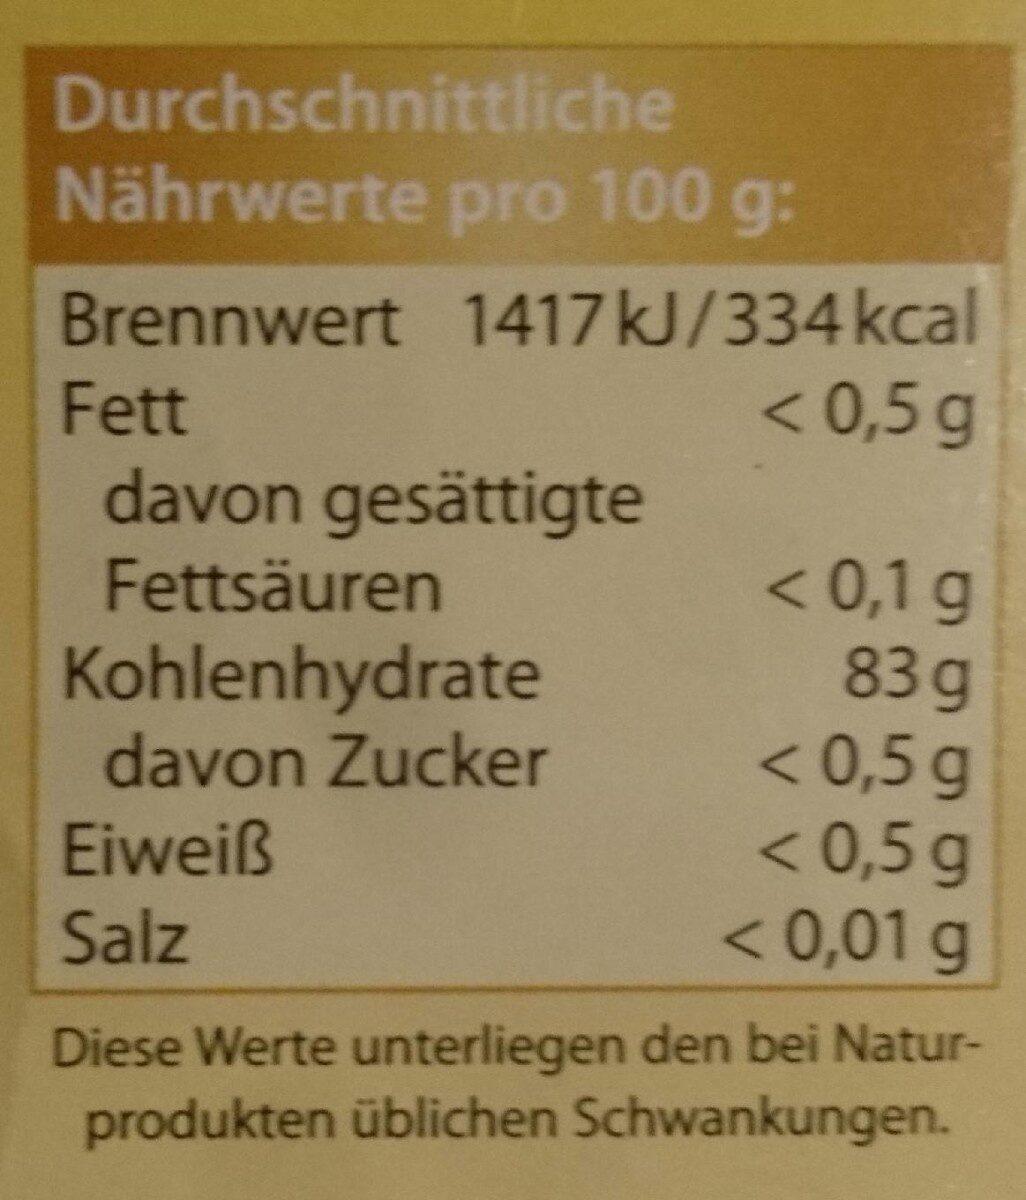 Kartoffelmehl - Nährwertangaben - de